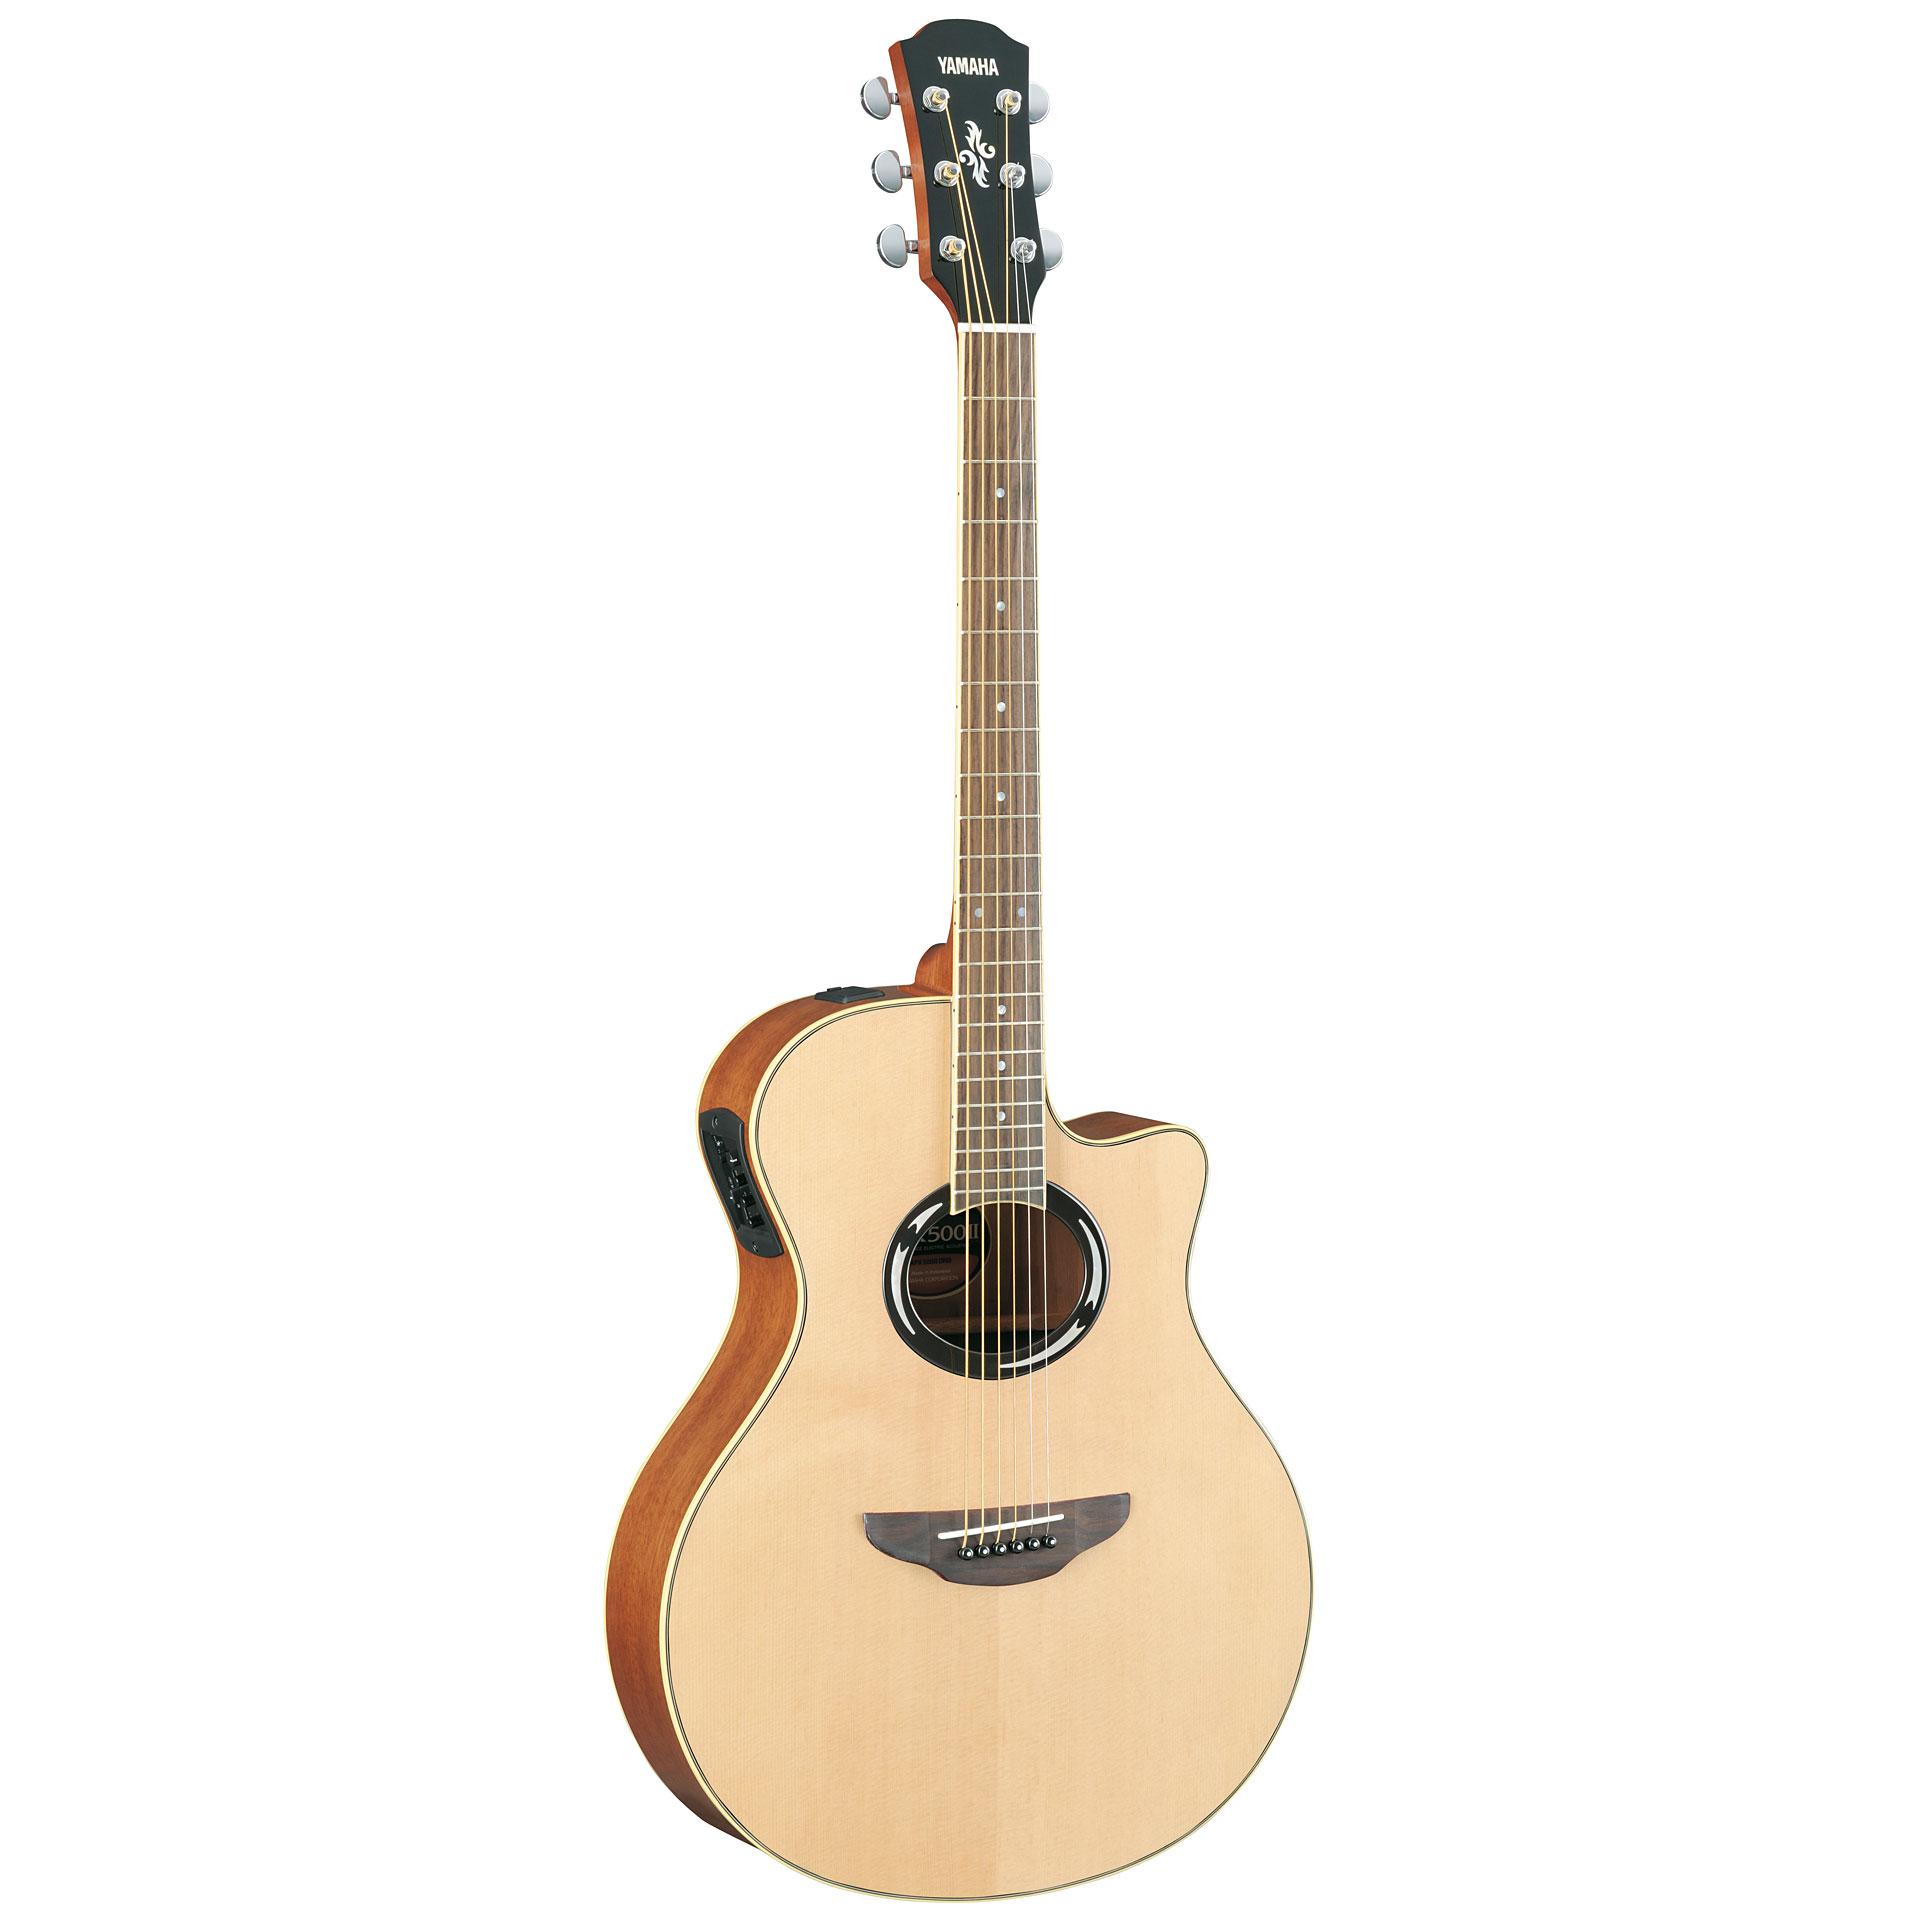 yamaha apx500iii nt guitare acoustique. Black Bedroom Furniture Sets. Home Design Ideas